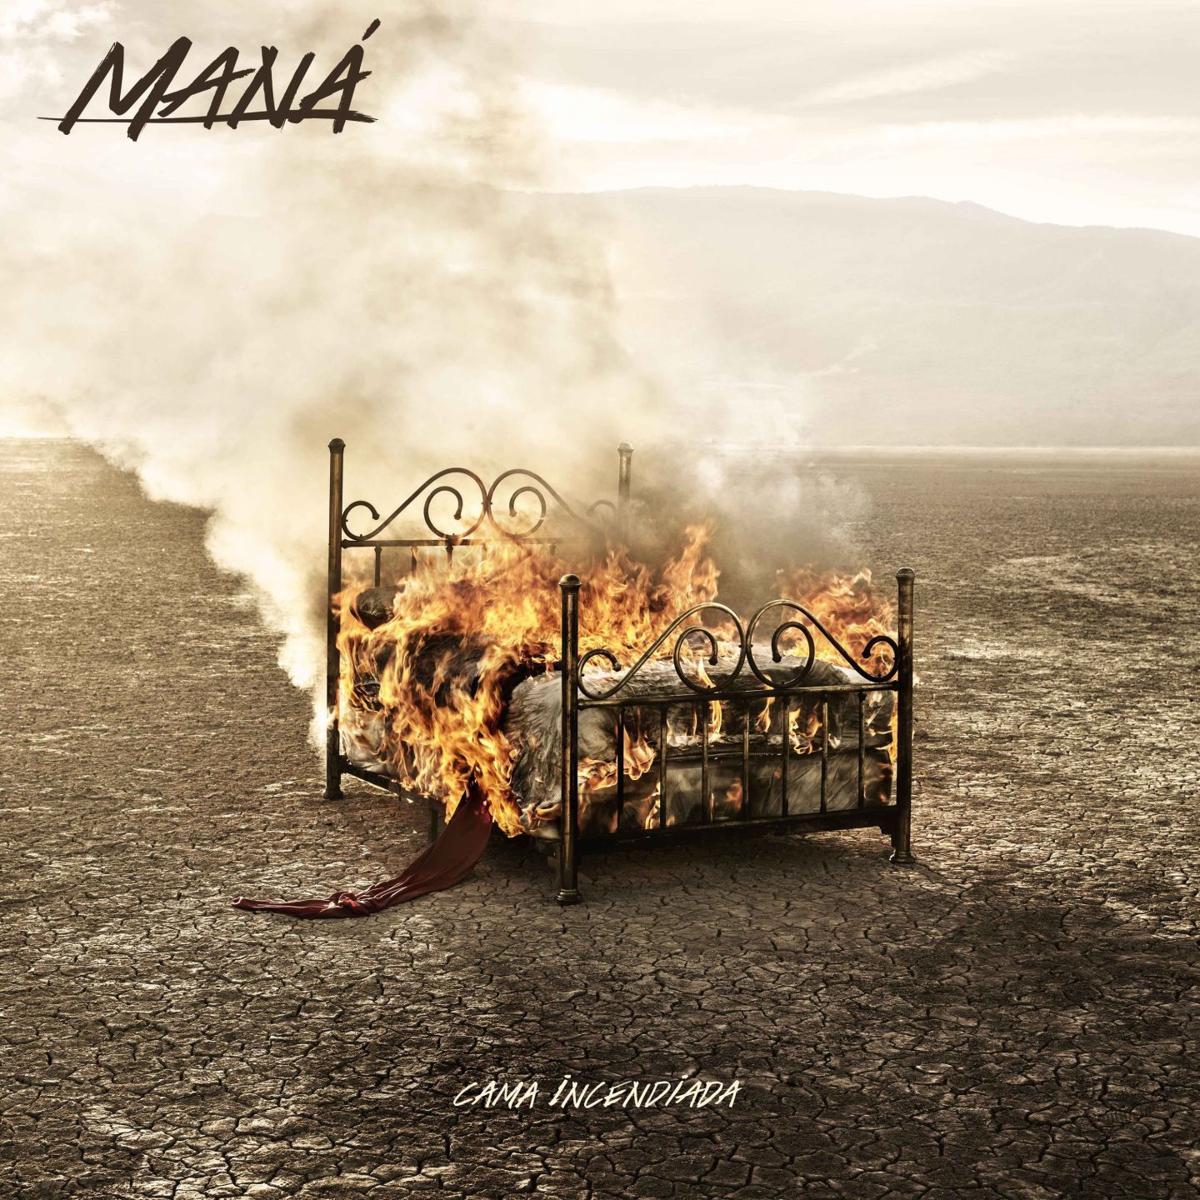 Mana, 'Cama Incendiada,' Warner Music